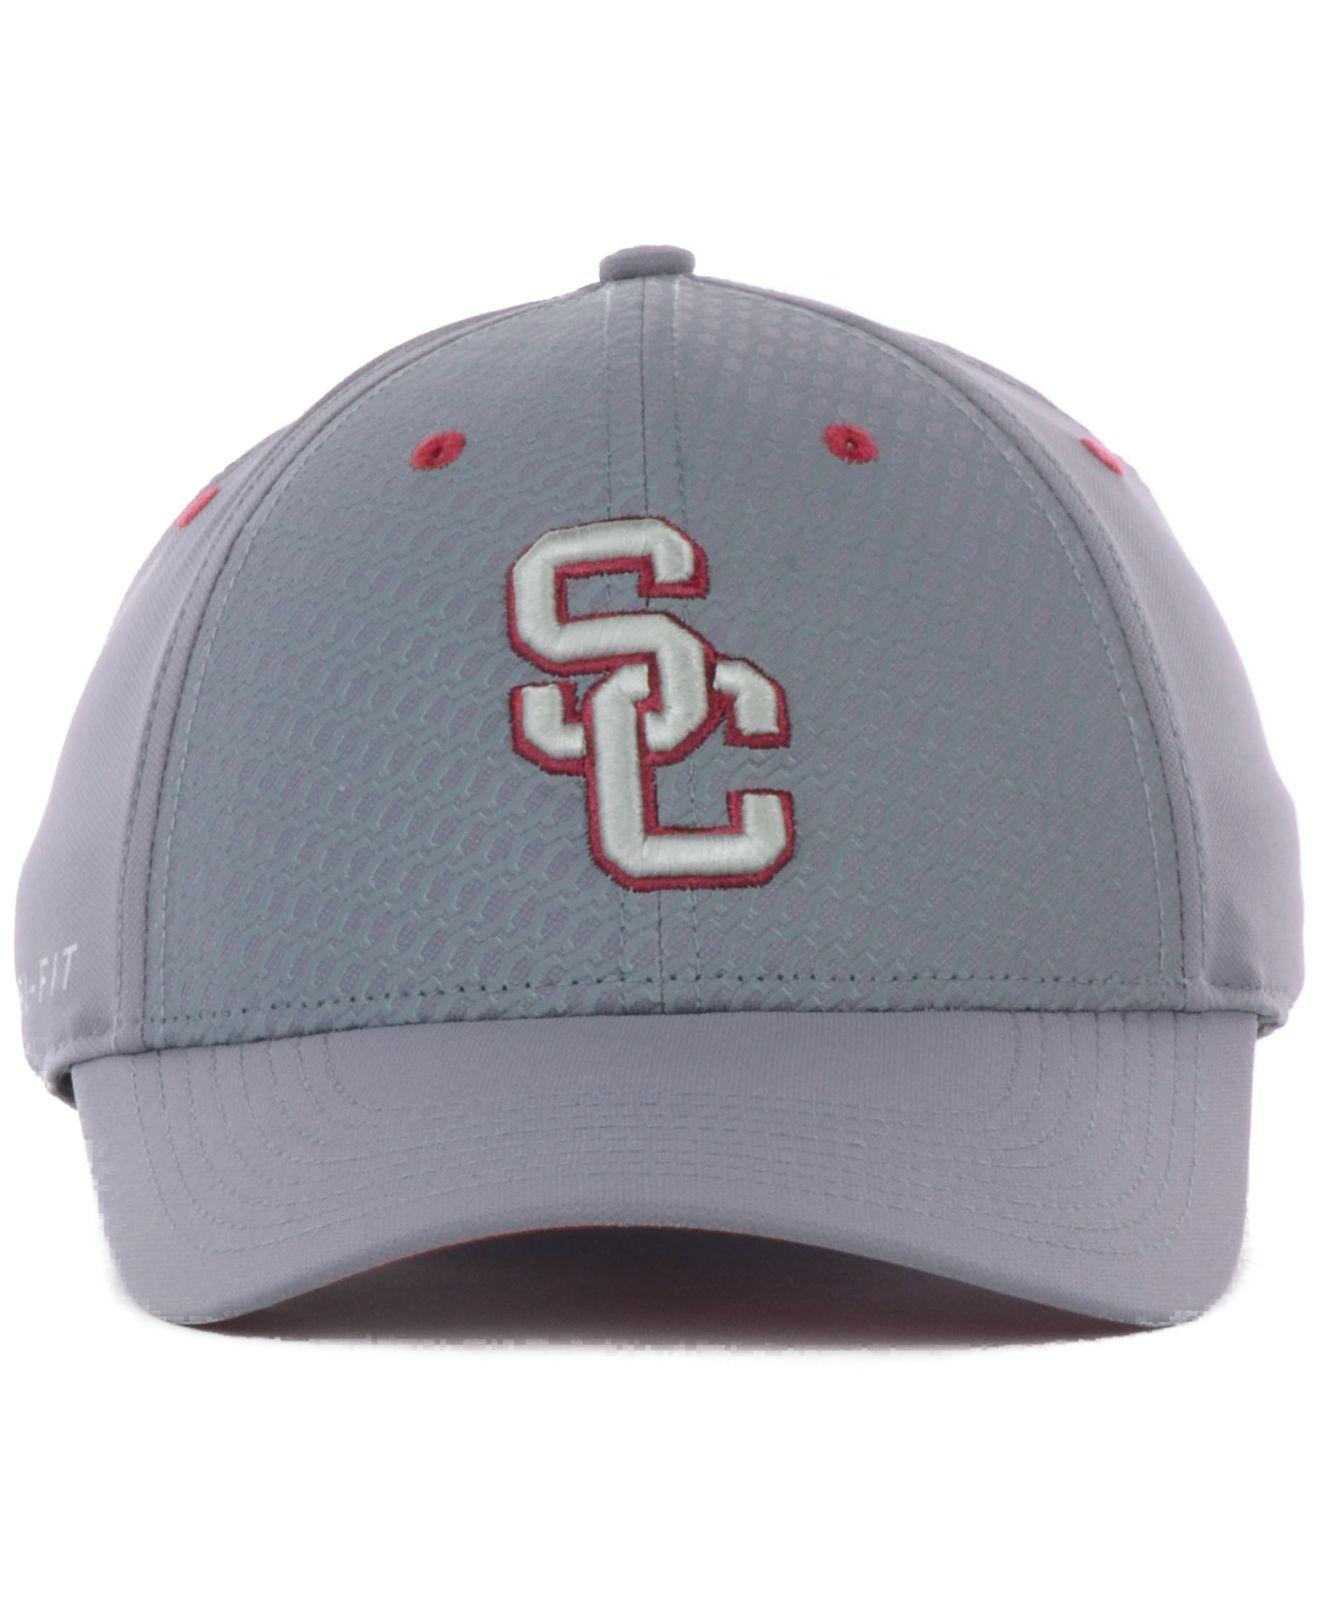 detailed look 25f73 2dfa2 ... sweden ncaa hats texas bx0193 longhorns new f33a7 promo code for lyst  nike usc trojans superfan